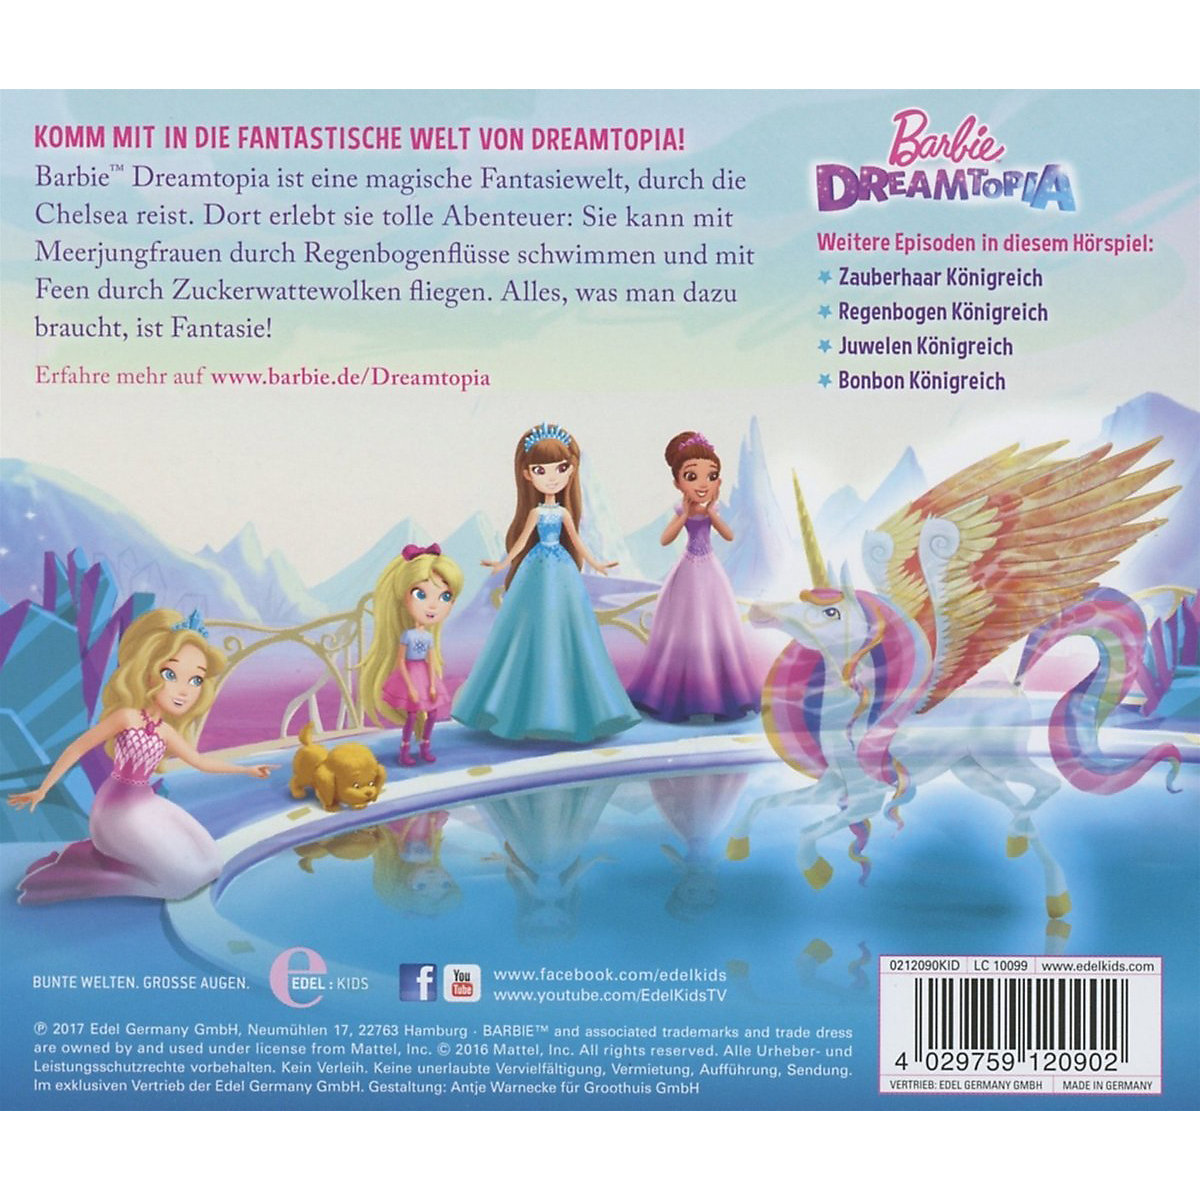 CD Barbie Dreamtopia - Chelsea im Traumland (Original-Hörspiel zum Film) Barbie cQvfm